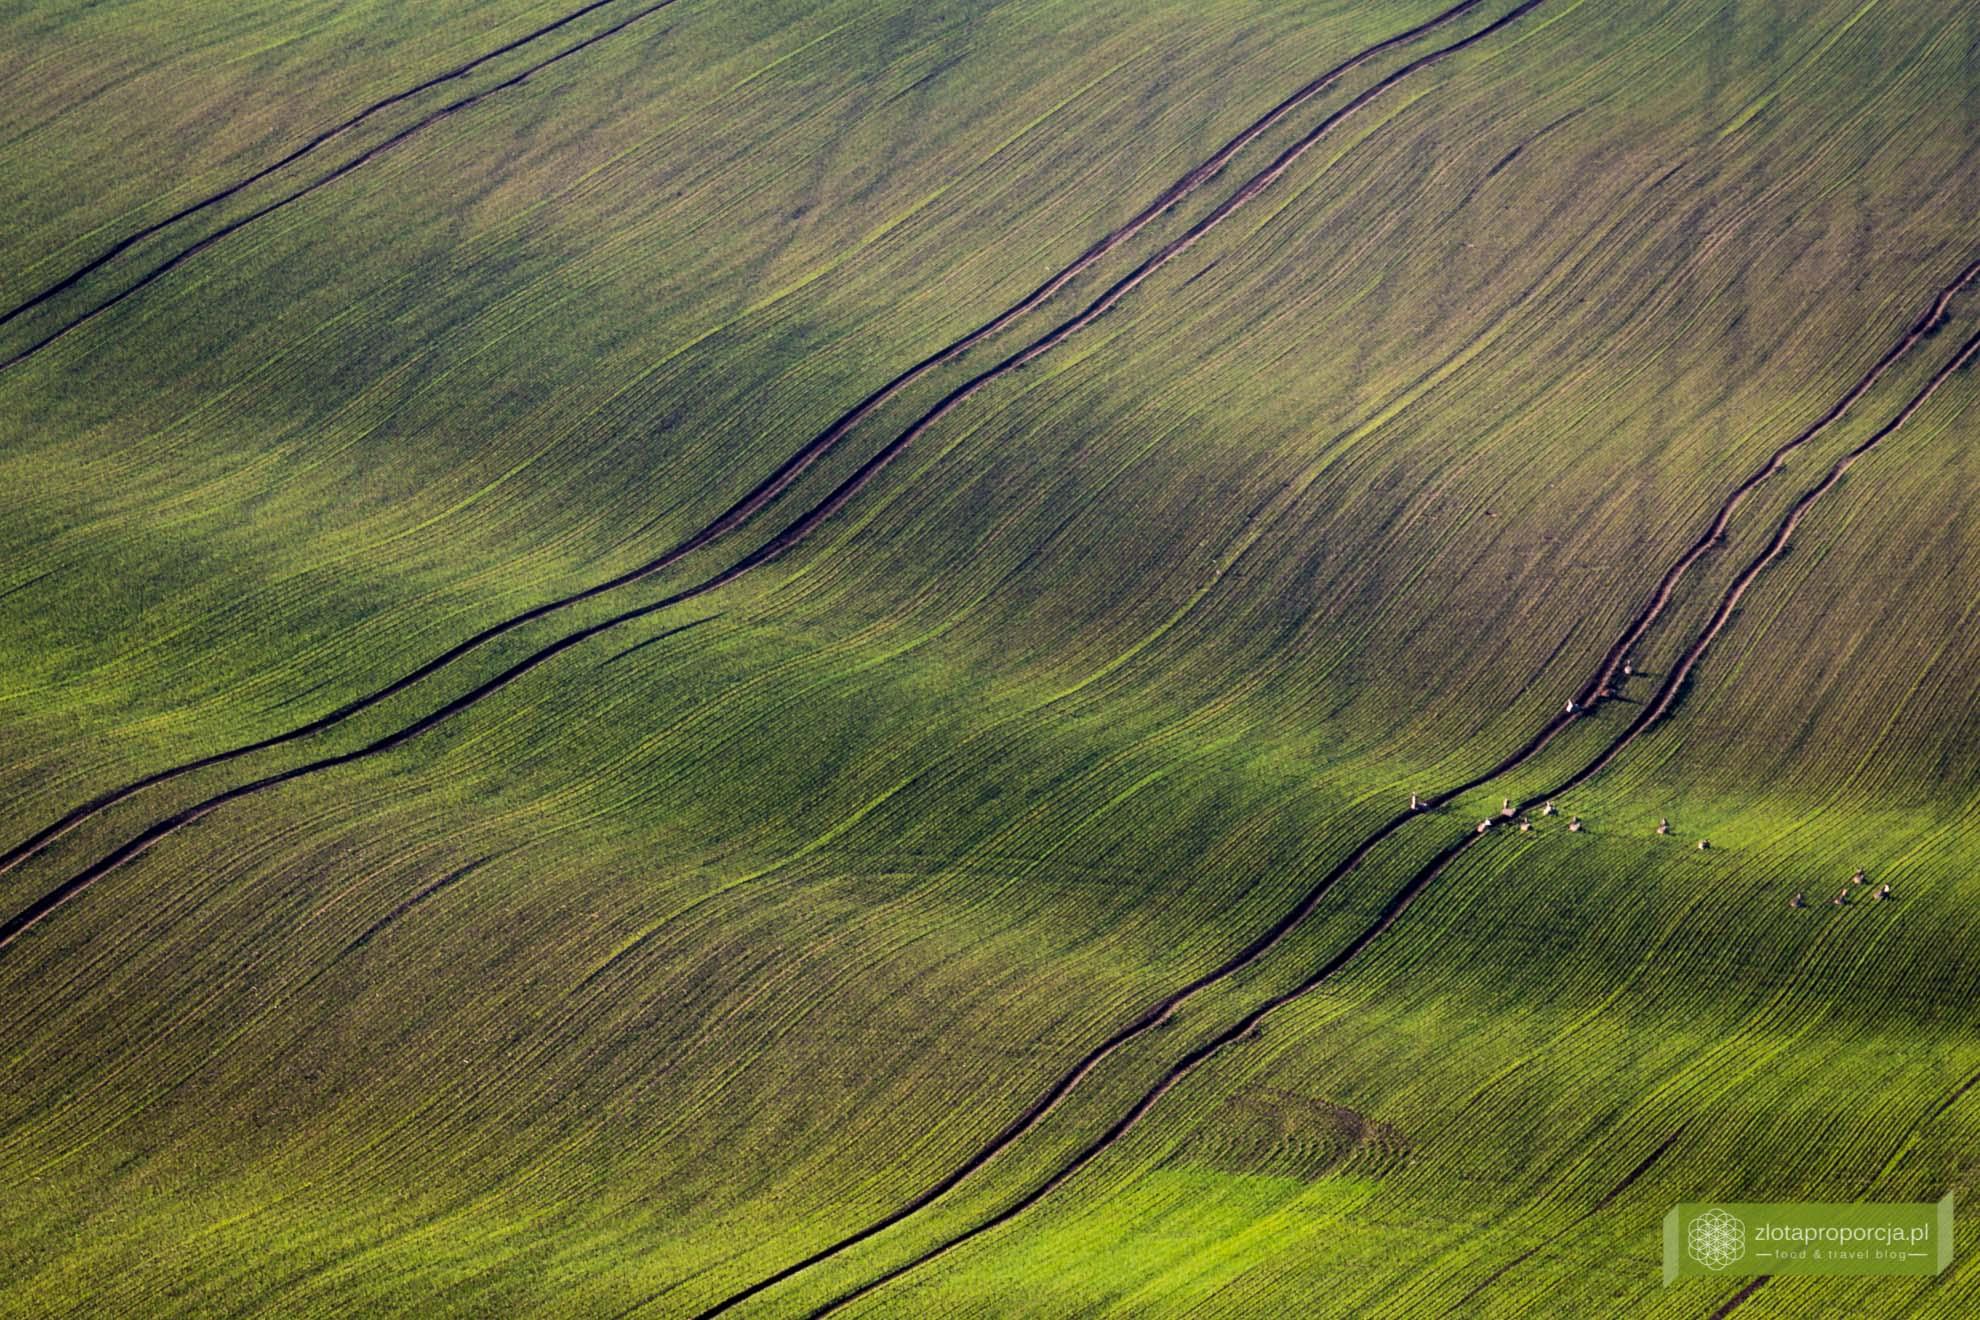 Morawy Południowe, Kyjov, morawskie pola, atrakcje Moraw